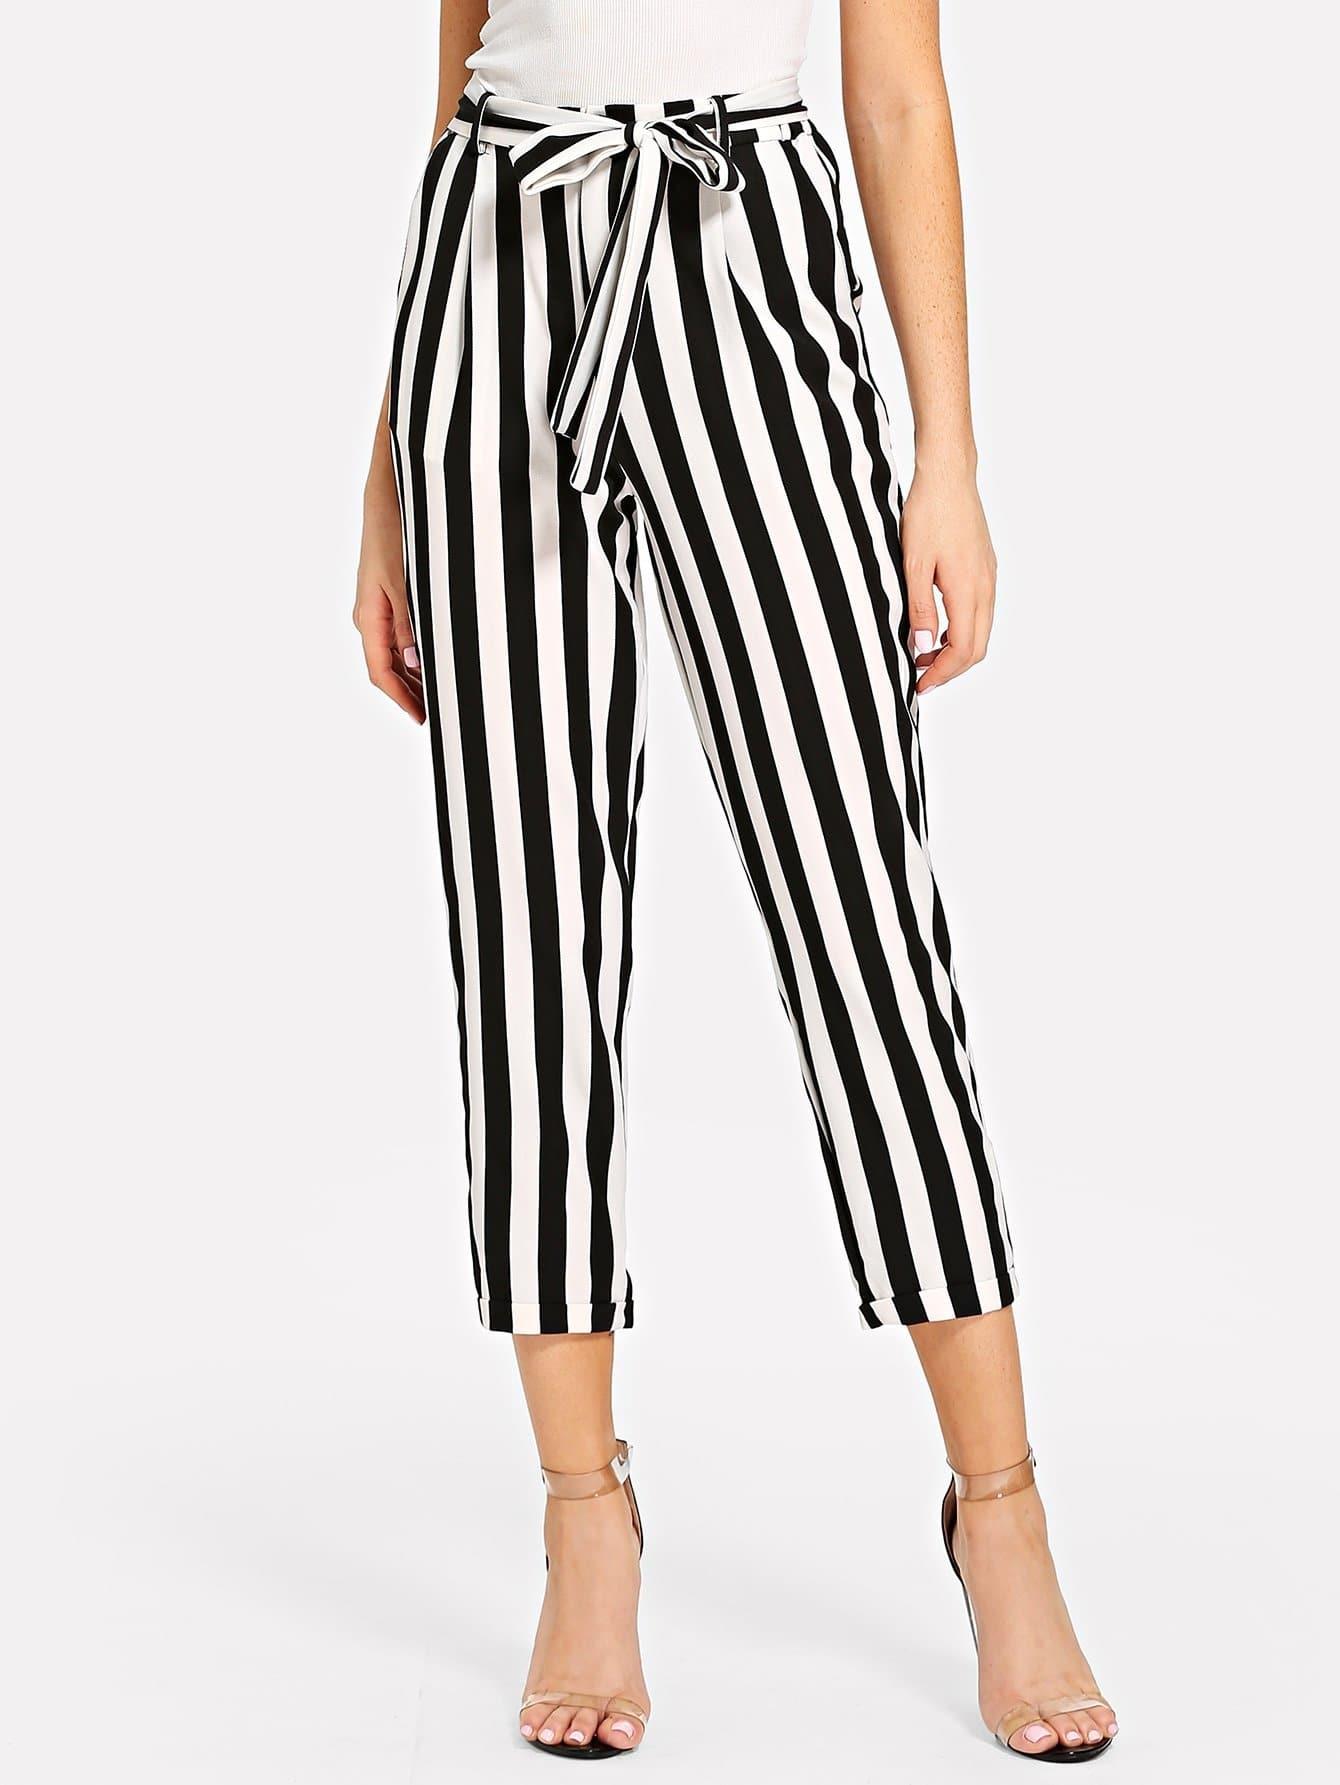 Cuffed Leg Striped Pants solid cuffed pants